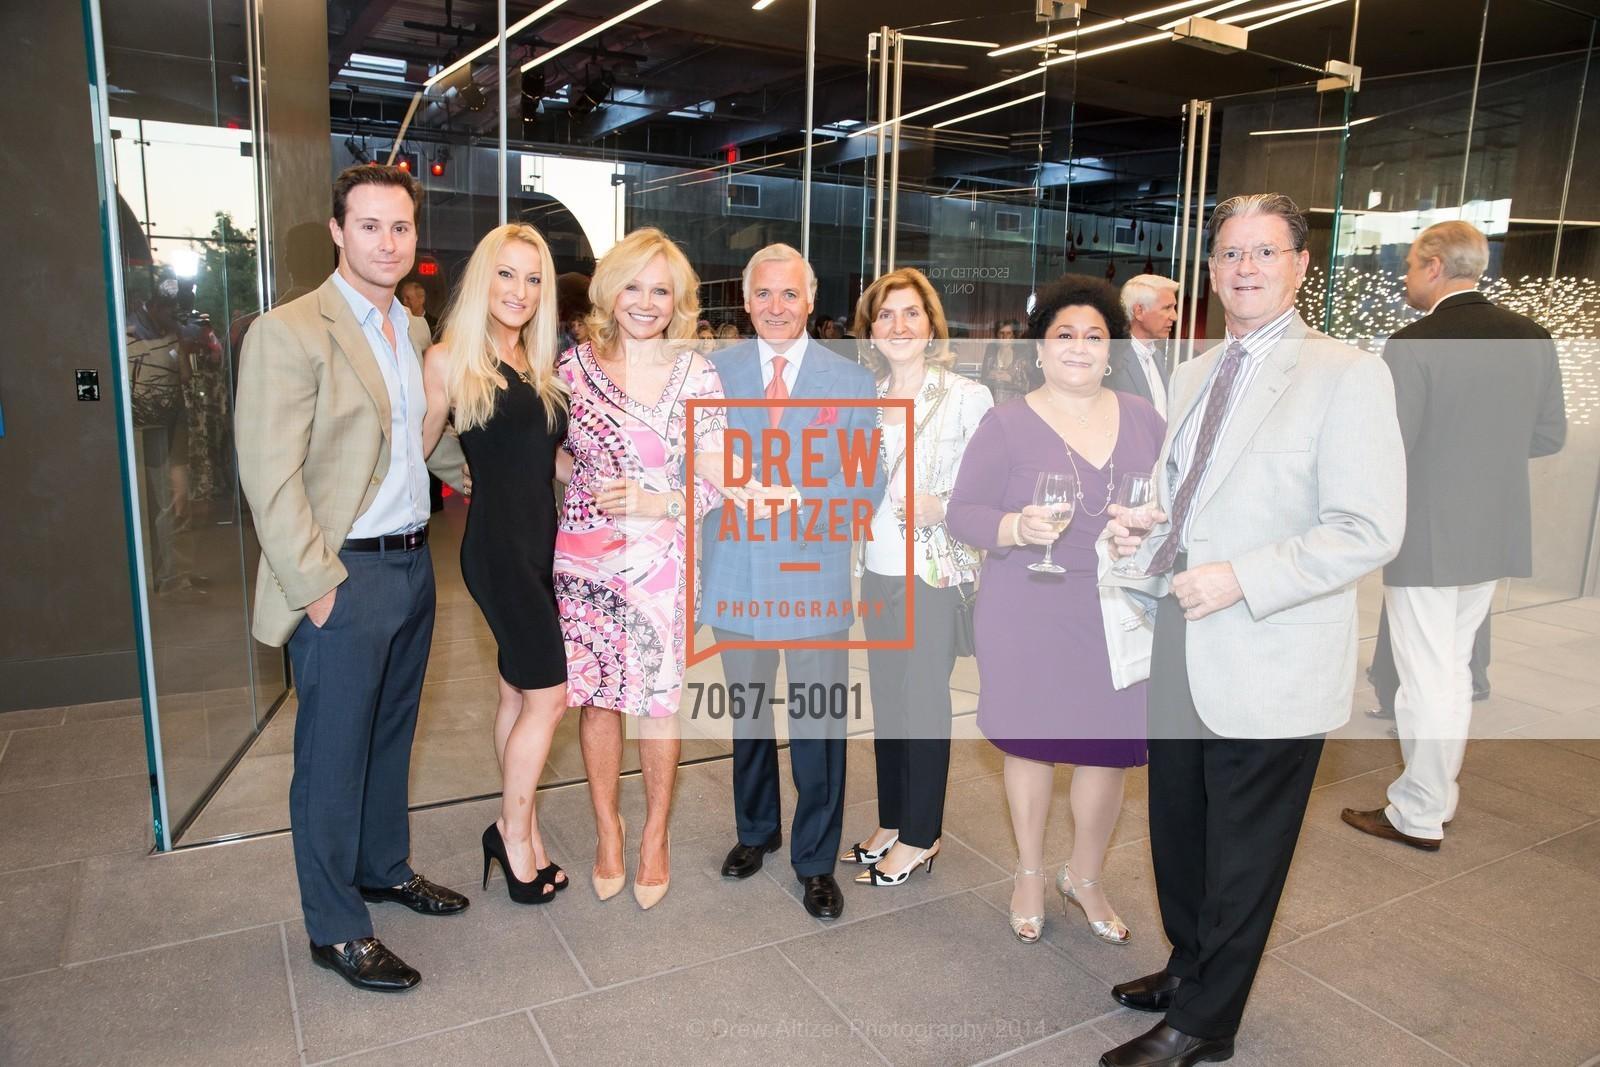 Jason Lafond, Brandie Lafond, Kathryn Hall, Antonio Castellucci, Rita Castellucci, Photo #7067-5001